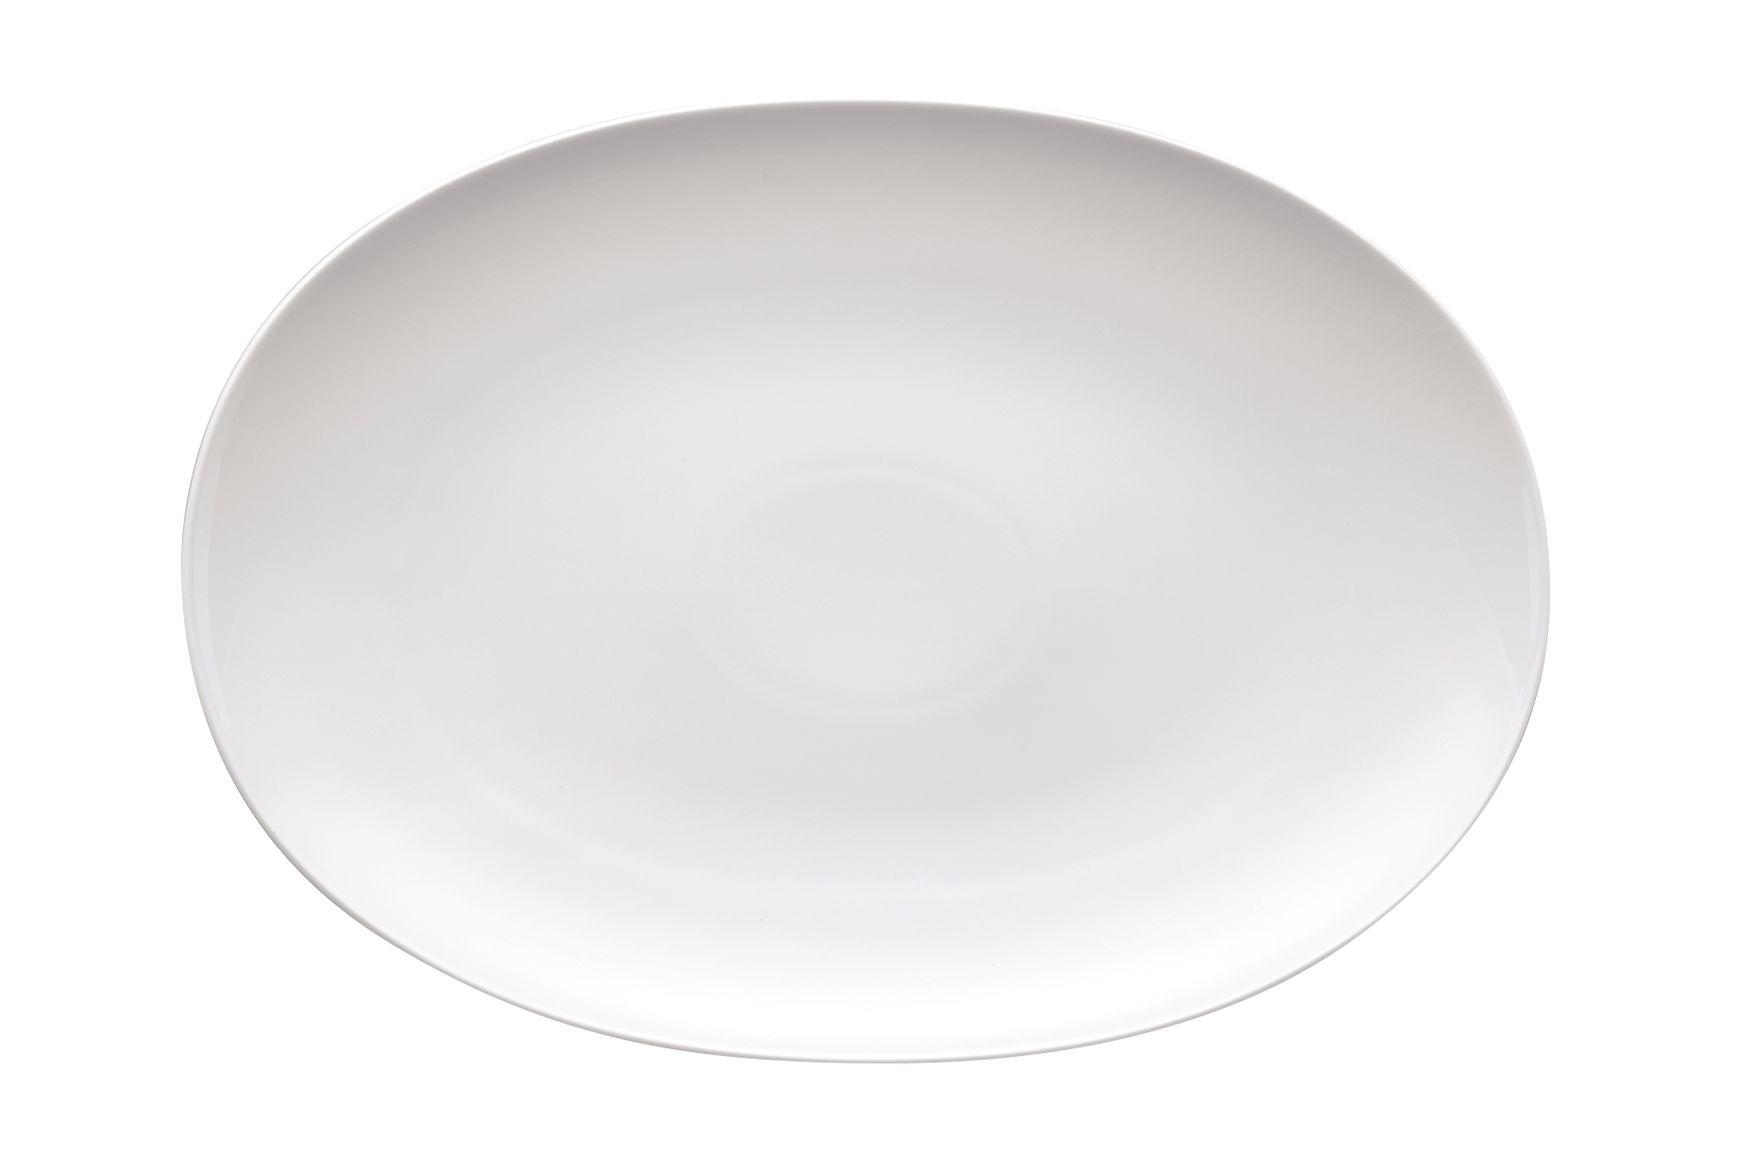 "Thomas Medaillon White Oval Plate / Platter 15"" thumb 1"